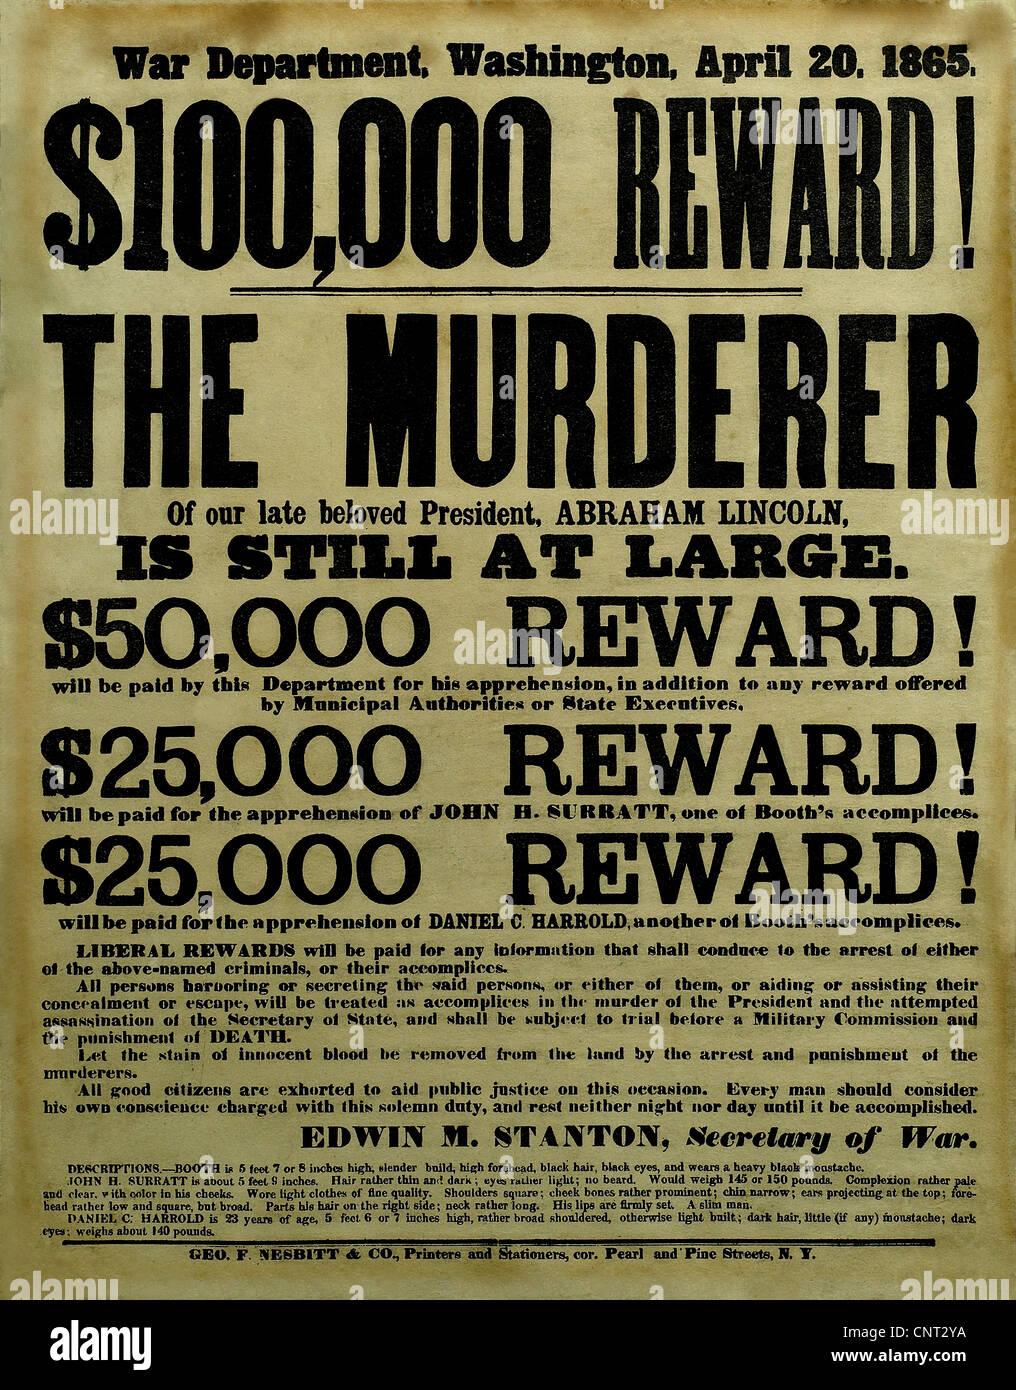 Vintage Civil War poster offering a reward for the capture of President Abraham Lincoln's assassins. - Stock Image